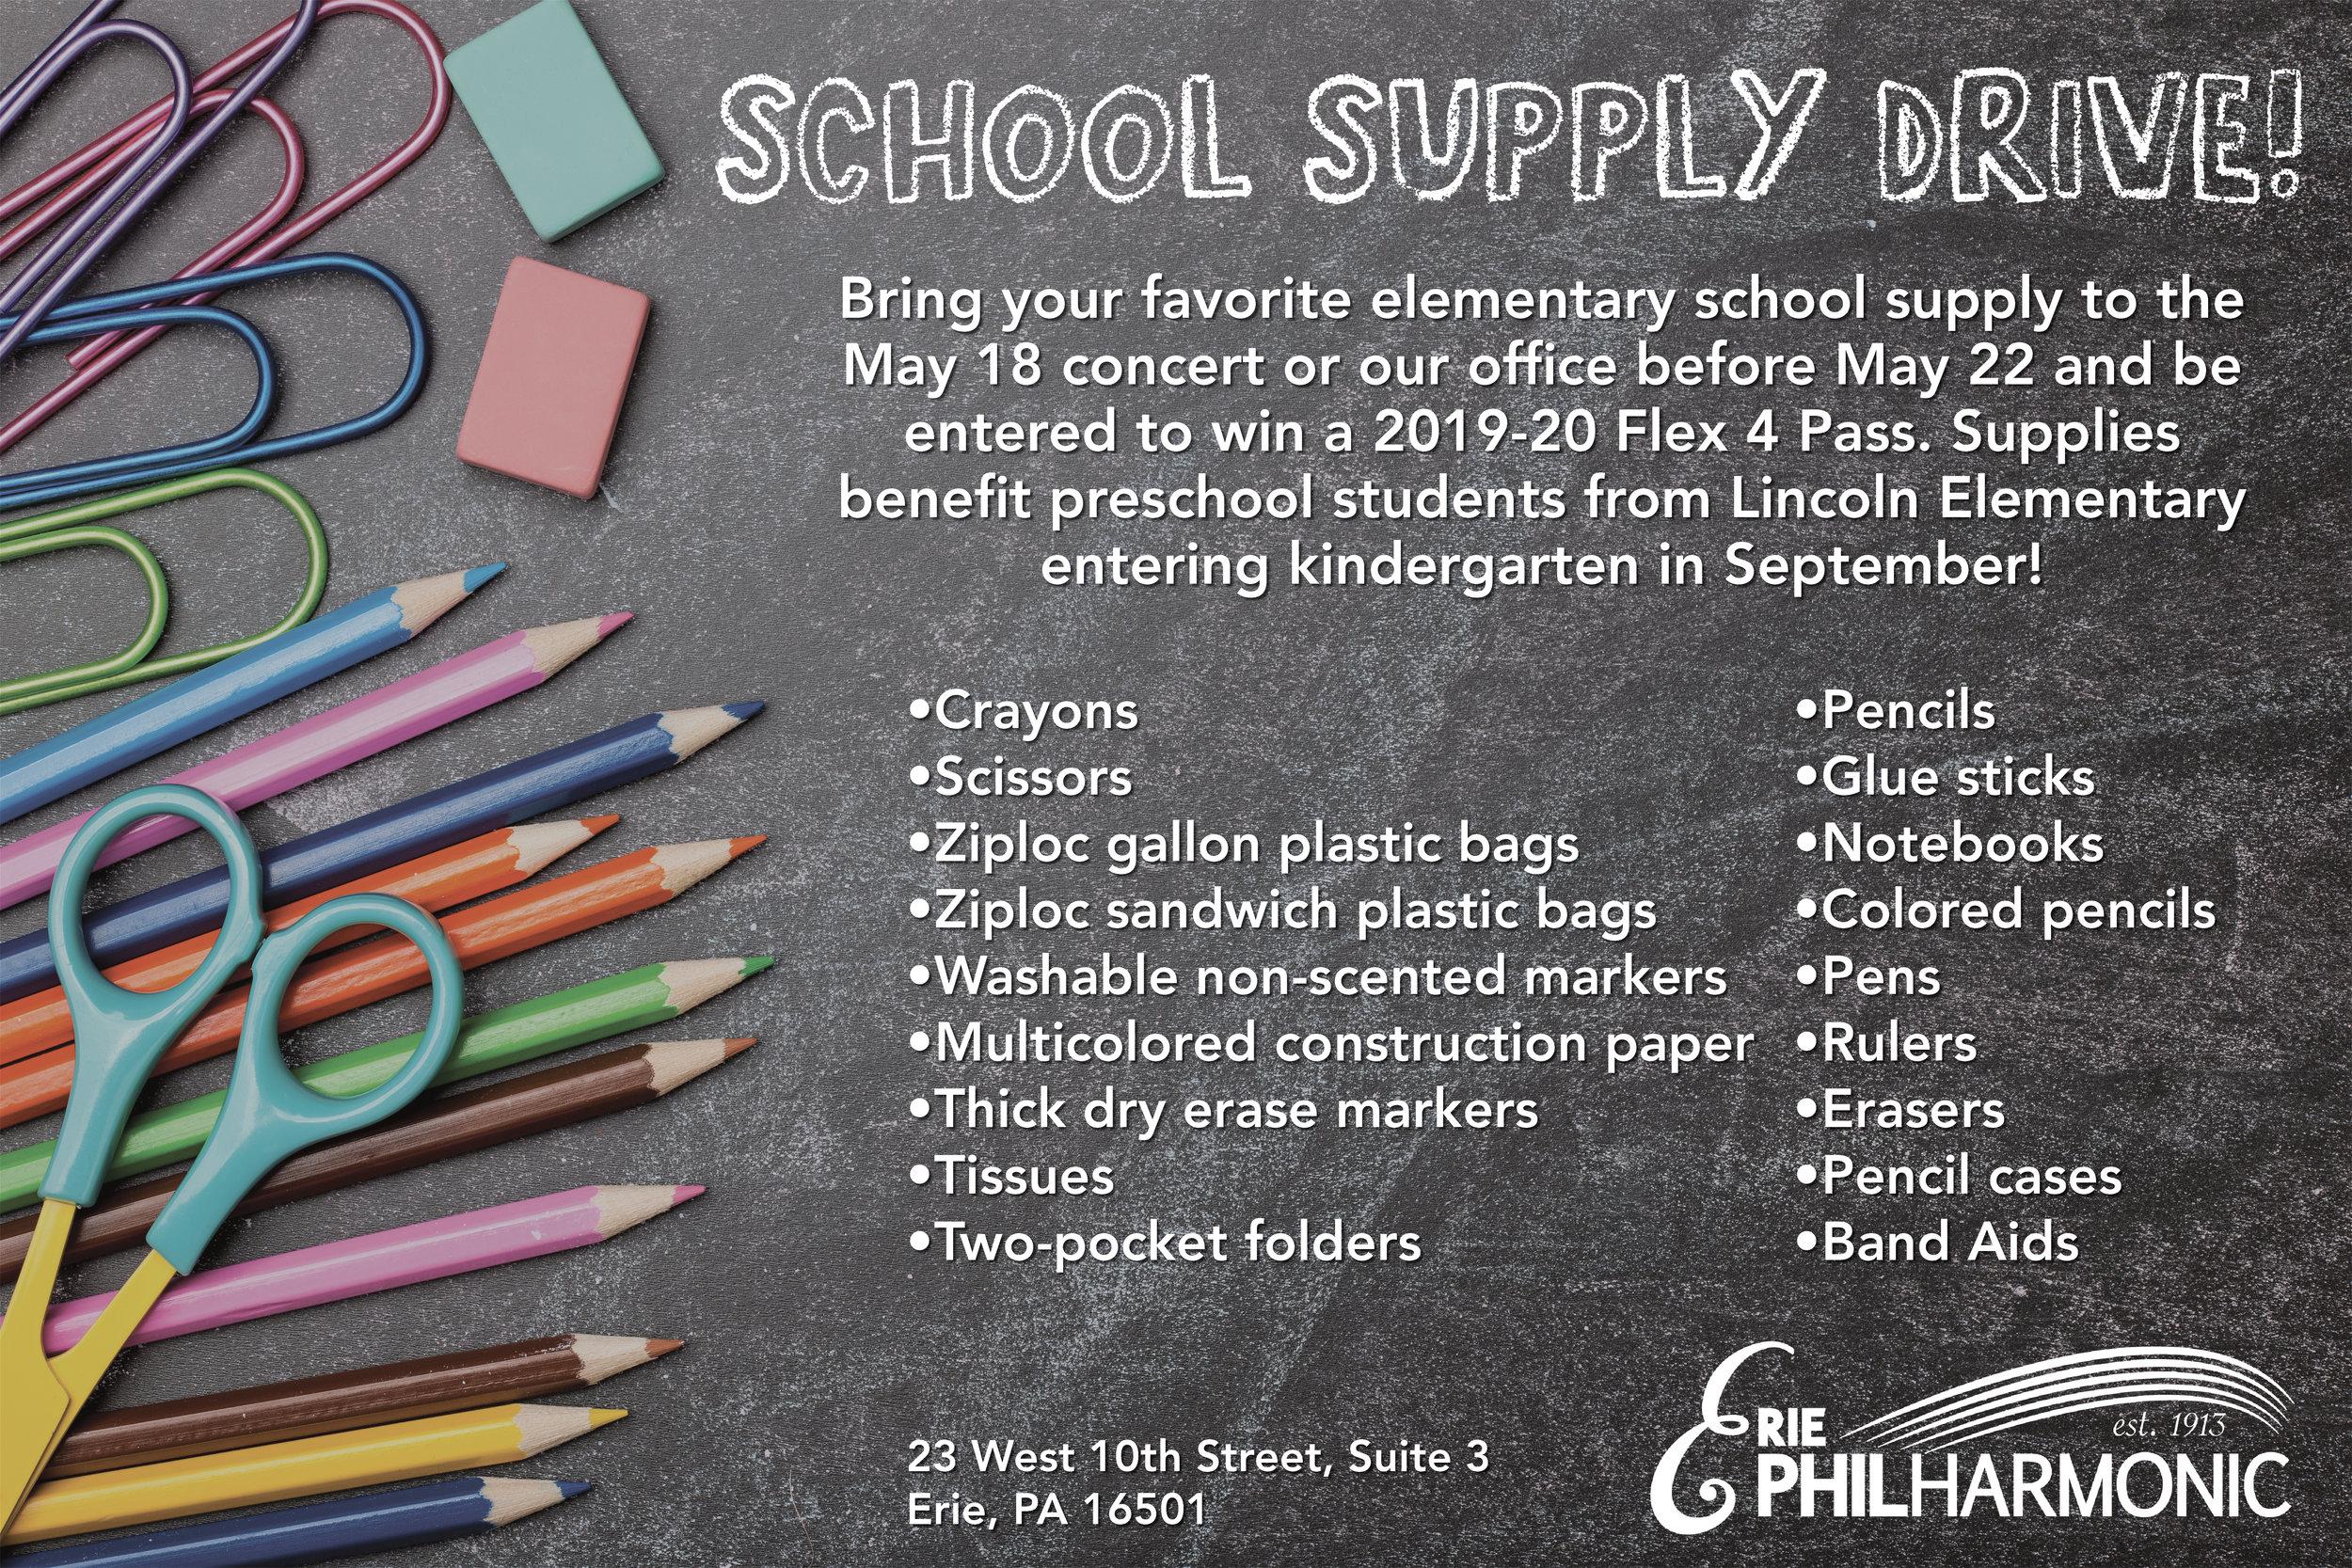 school supply drive graphic online.jpg